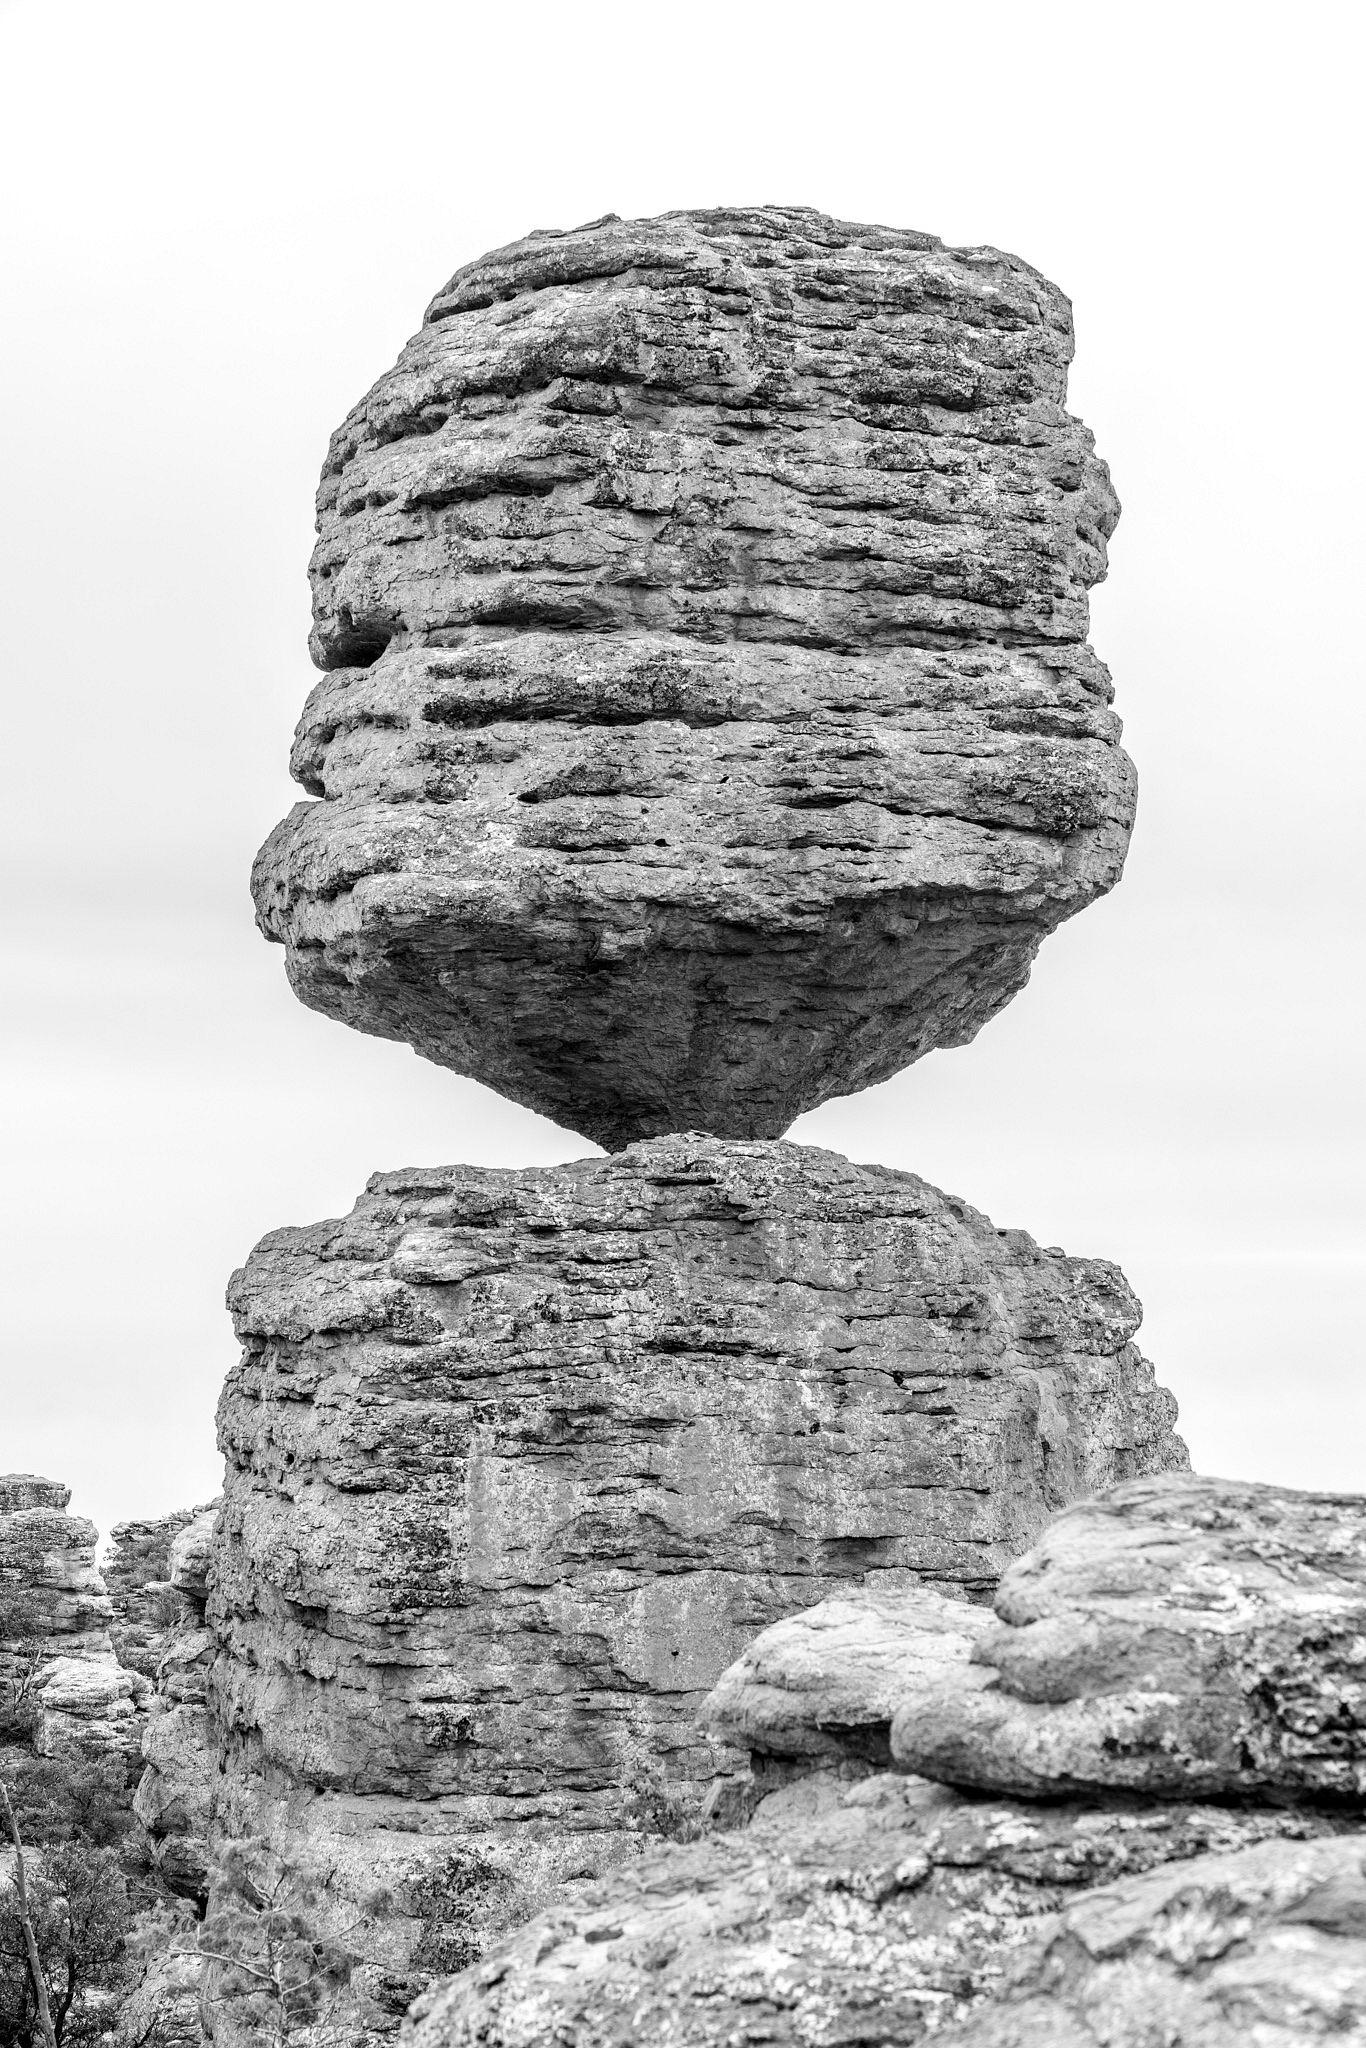 Big Balanced Rock, Chiricahua National Monument